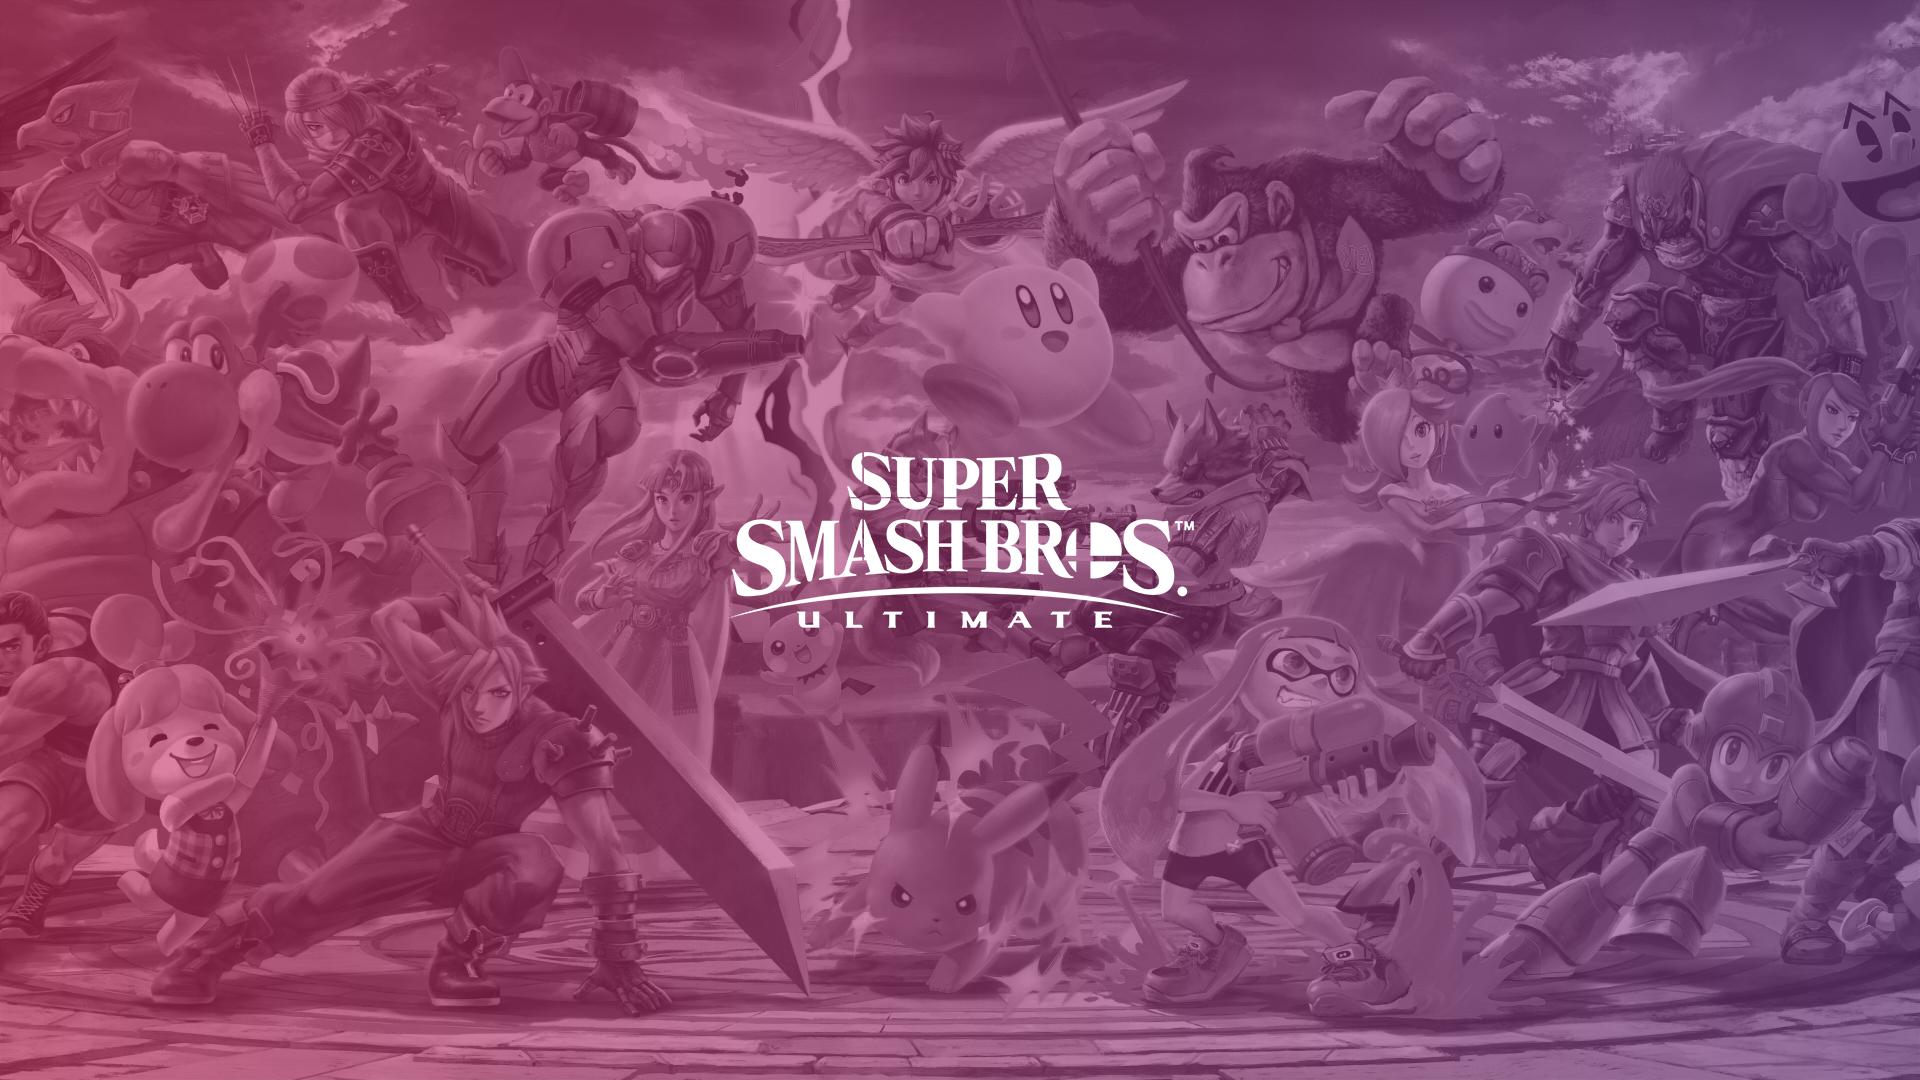 Super Smash Bros Ultimate Characters - HD Wallpaper